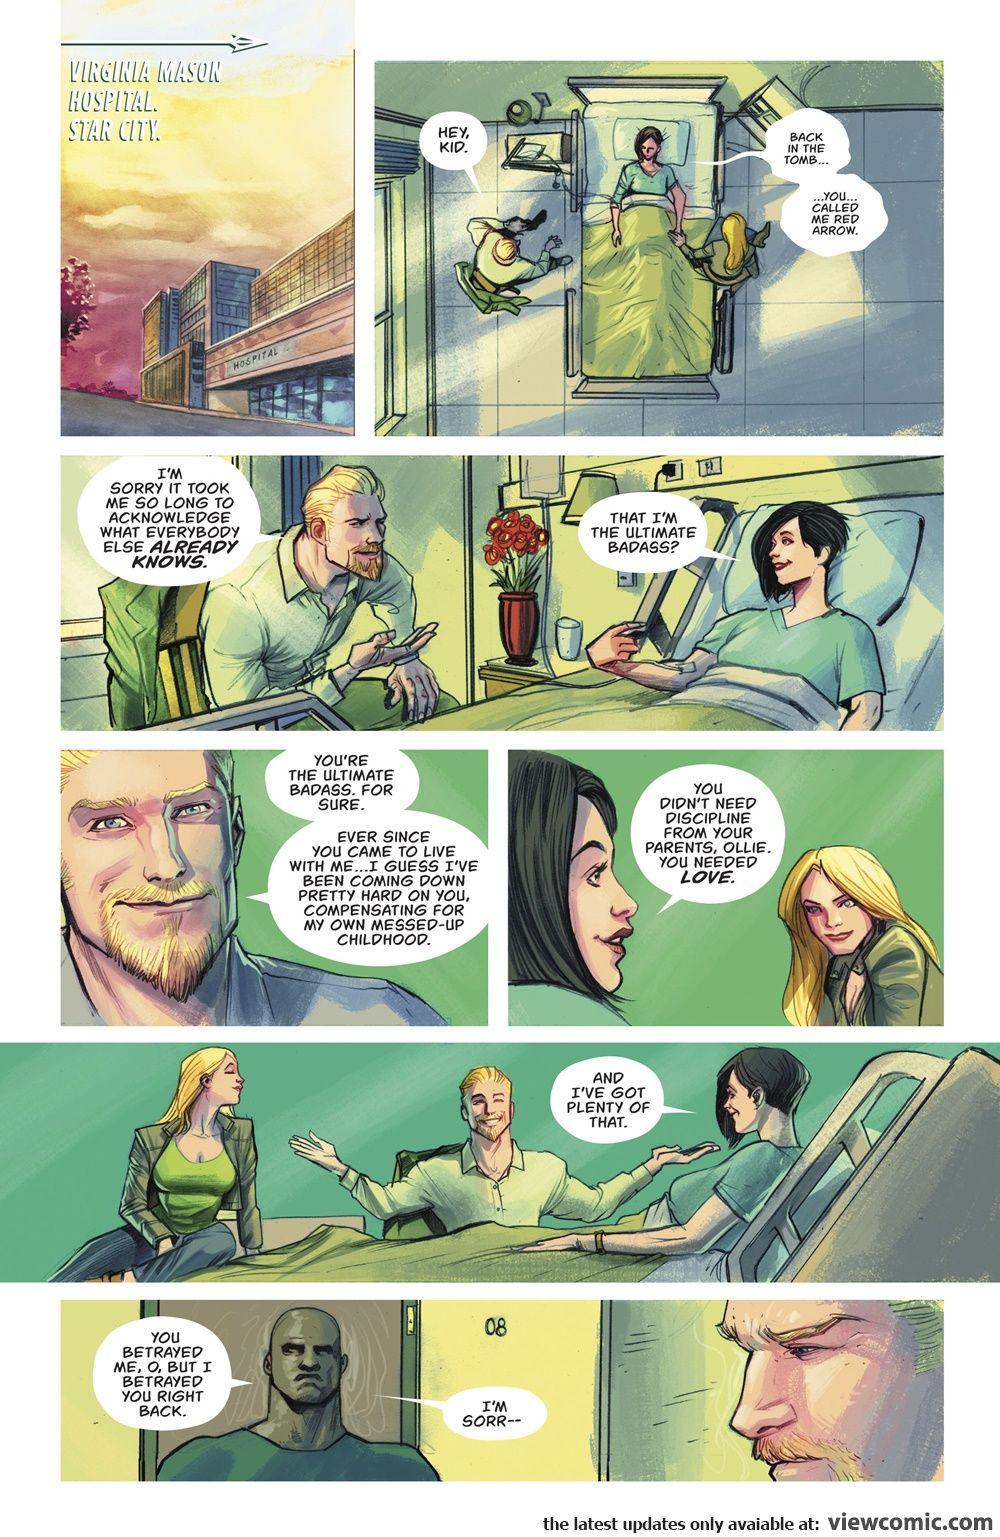 Green Arrow v7 037 (2018) ………………………… | View Comic | Green